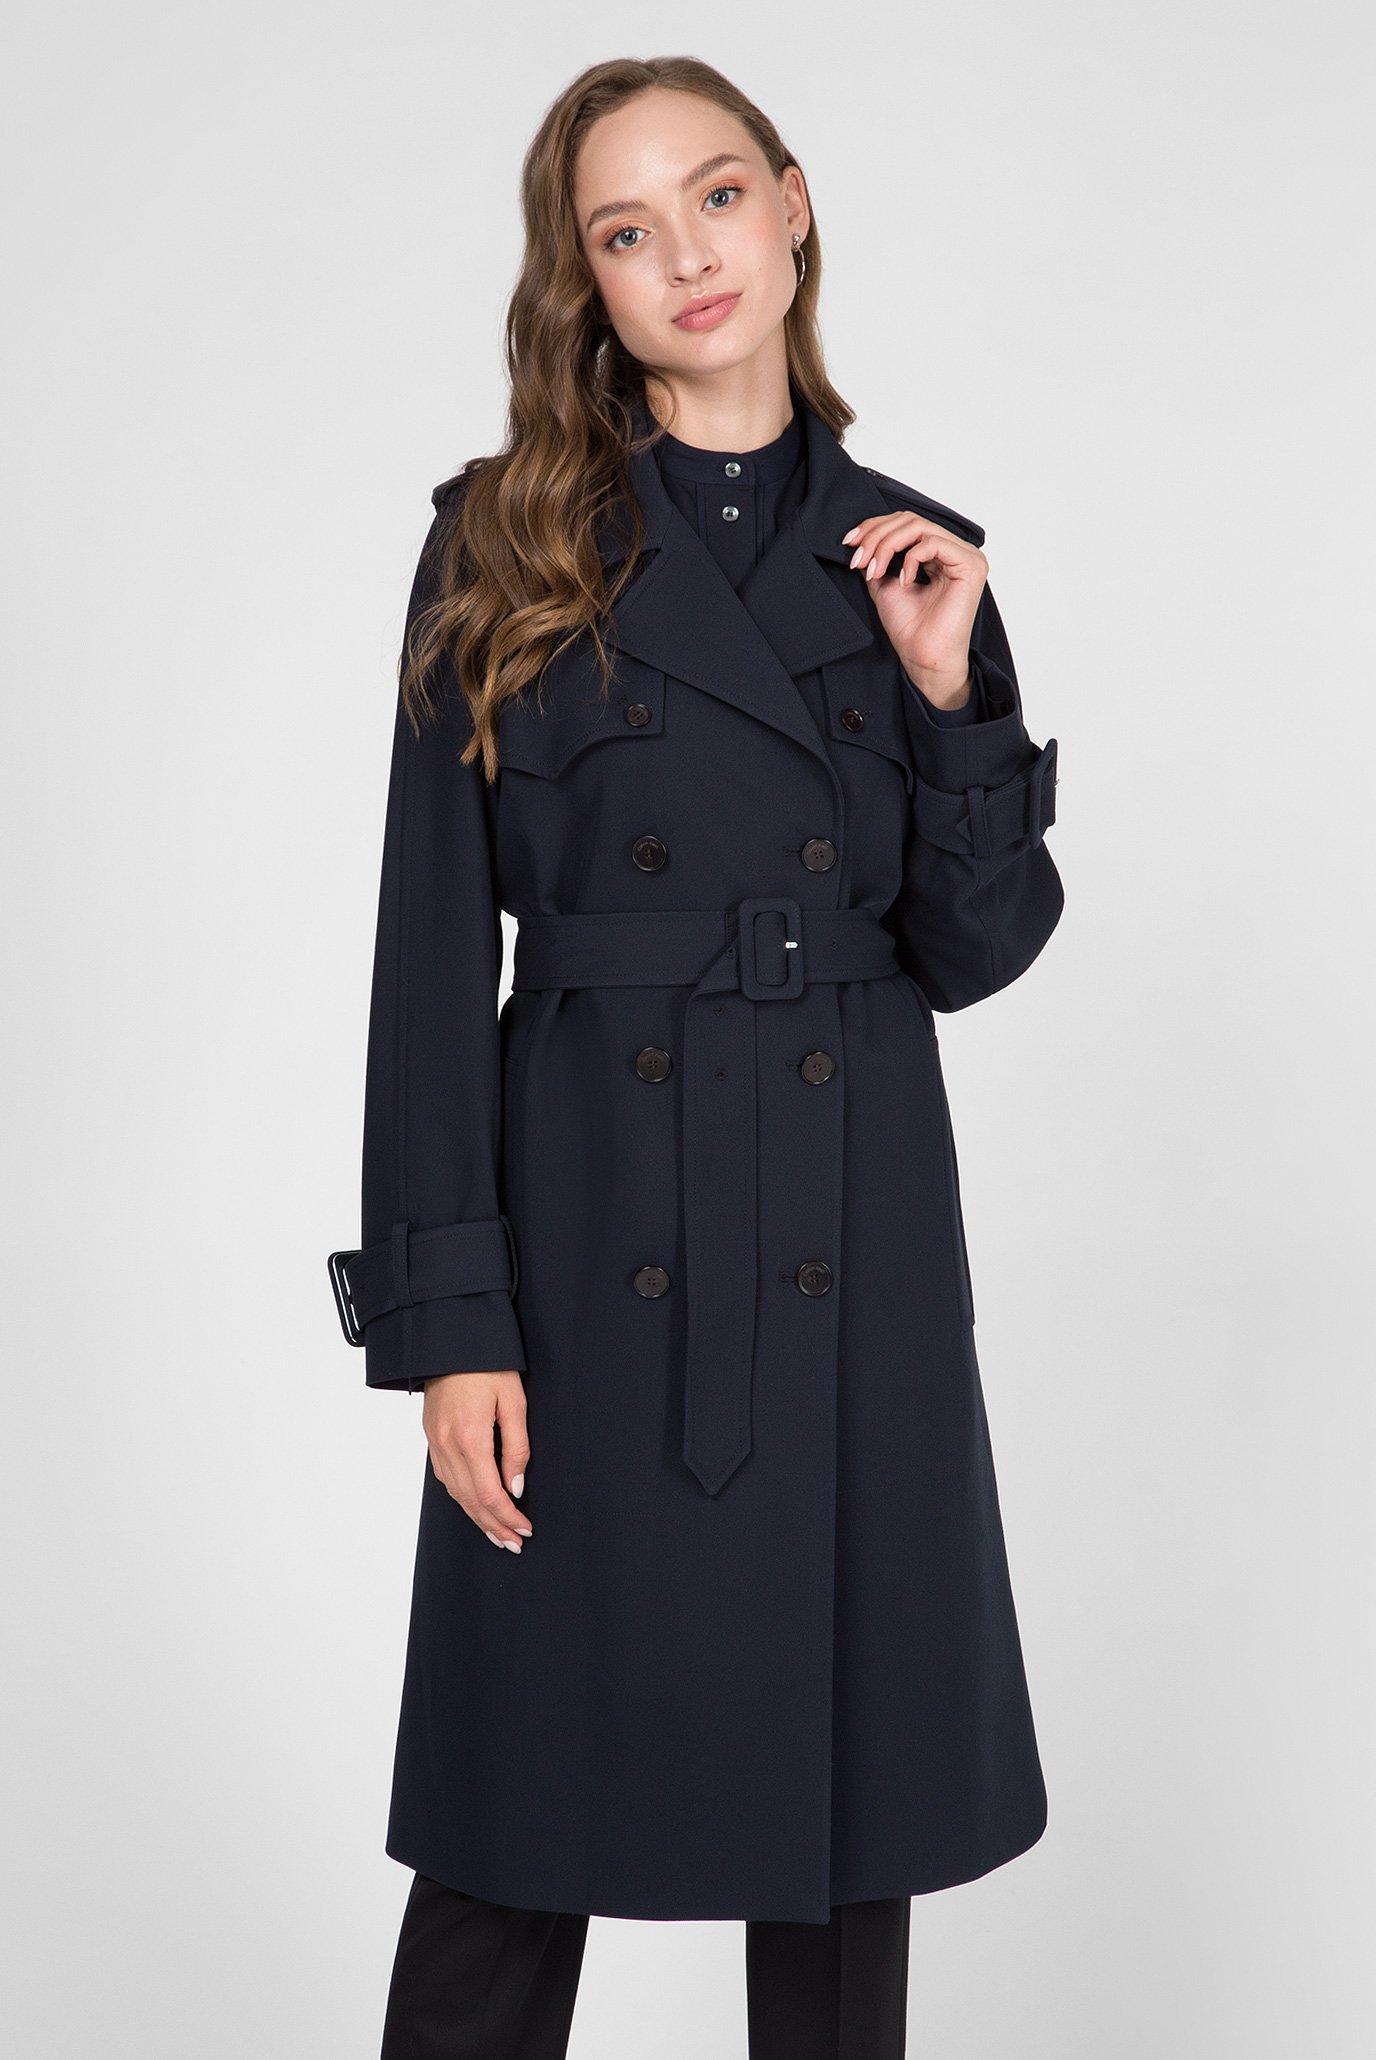 Женский темно-синий тренч Calvin Klein K20K200917 — MD-Fashion, баркод 8719851429916